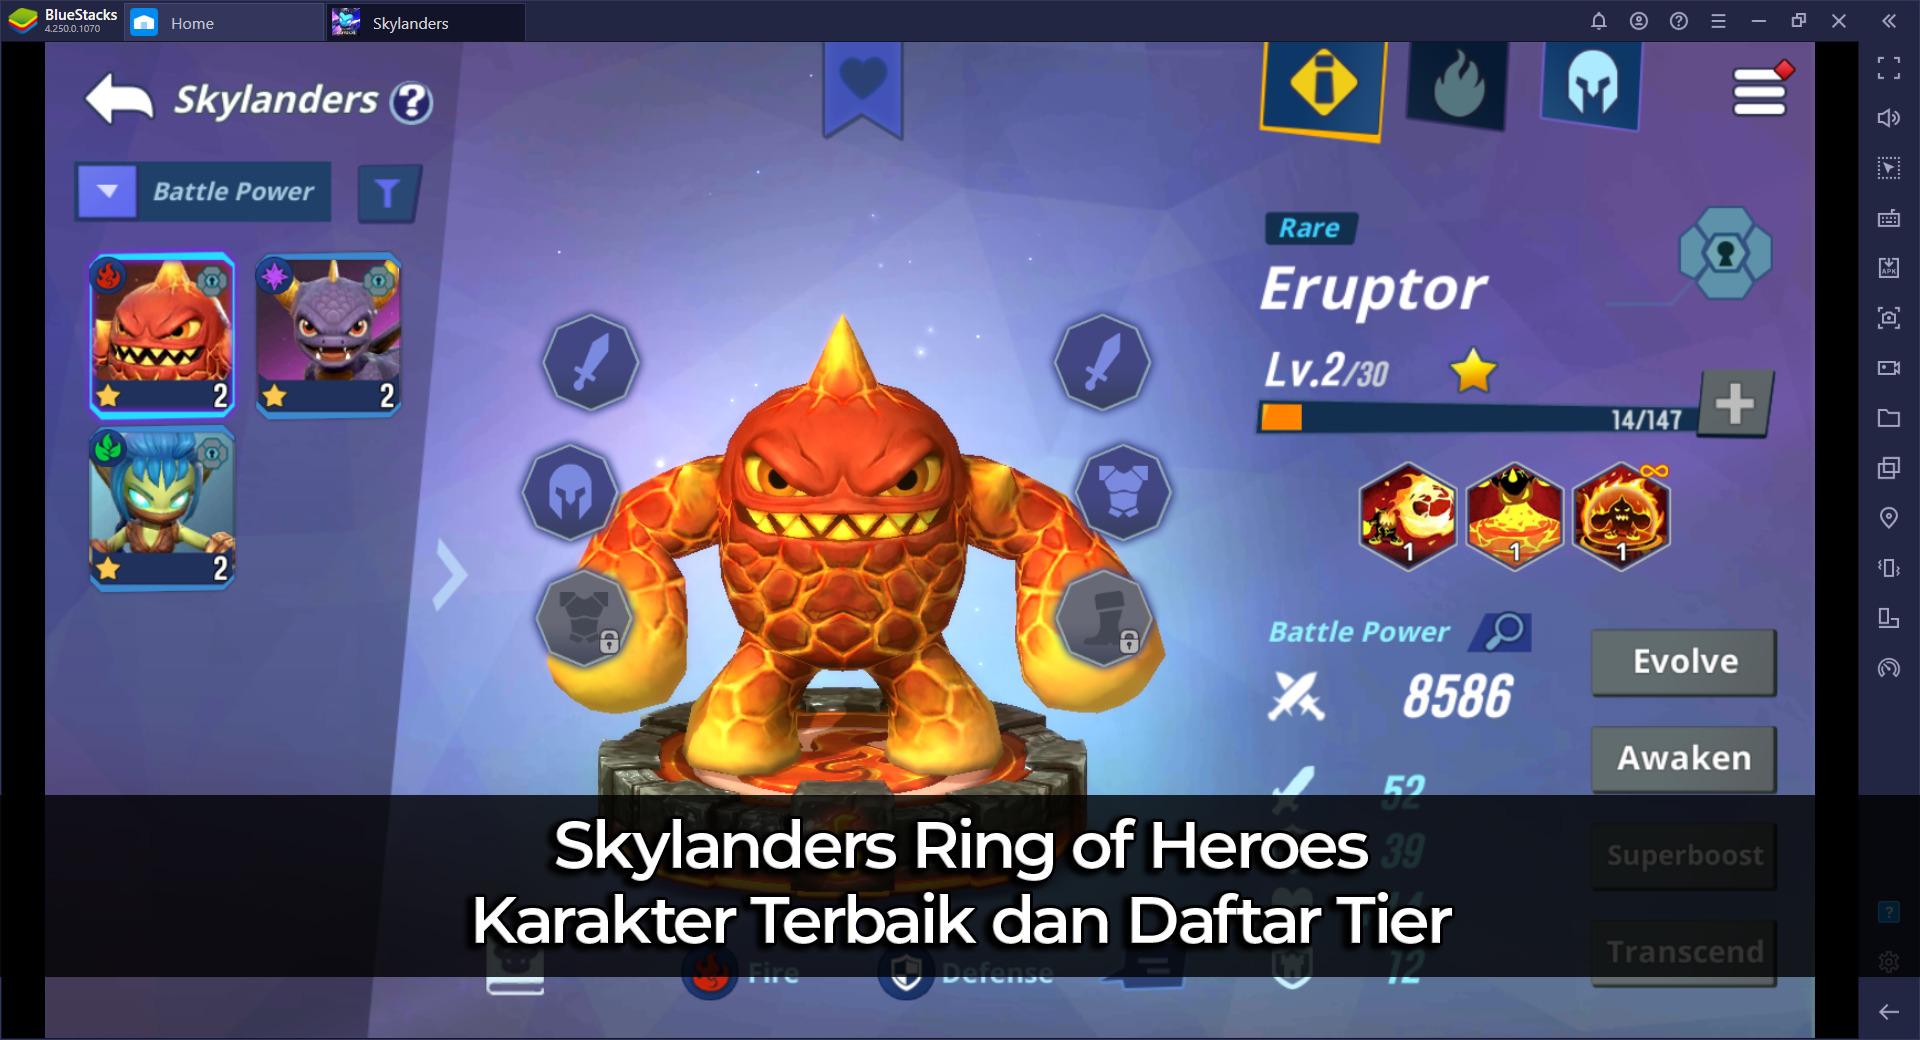 Skylanders Ring of Heroes Karakter Terbaik dan Daftar Tier